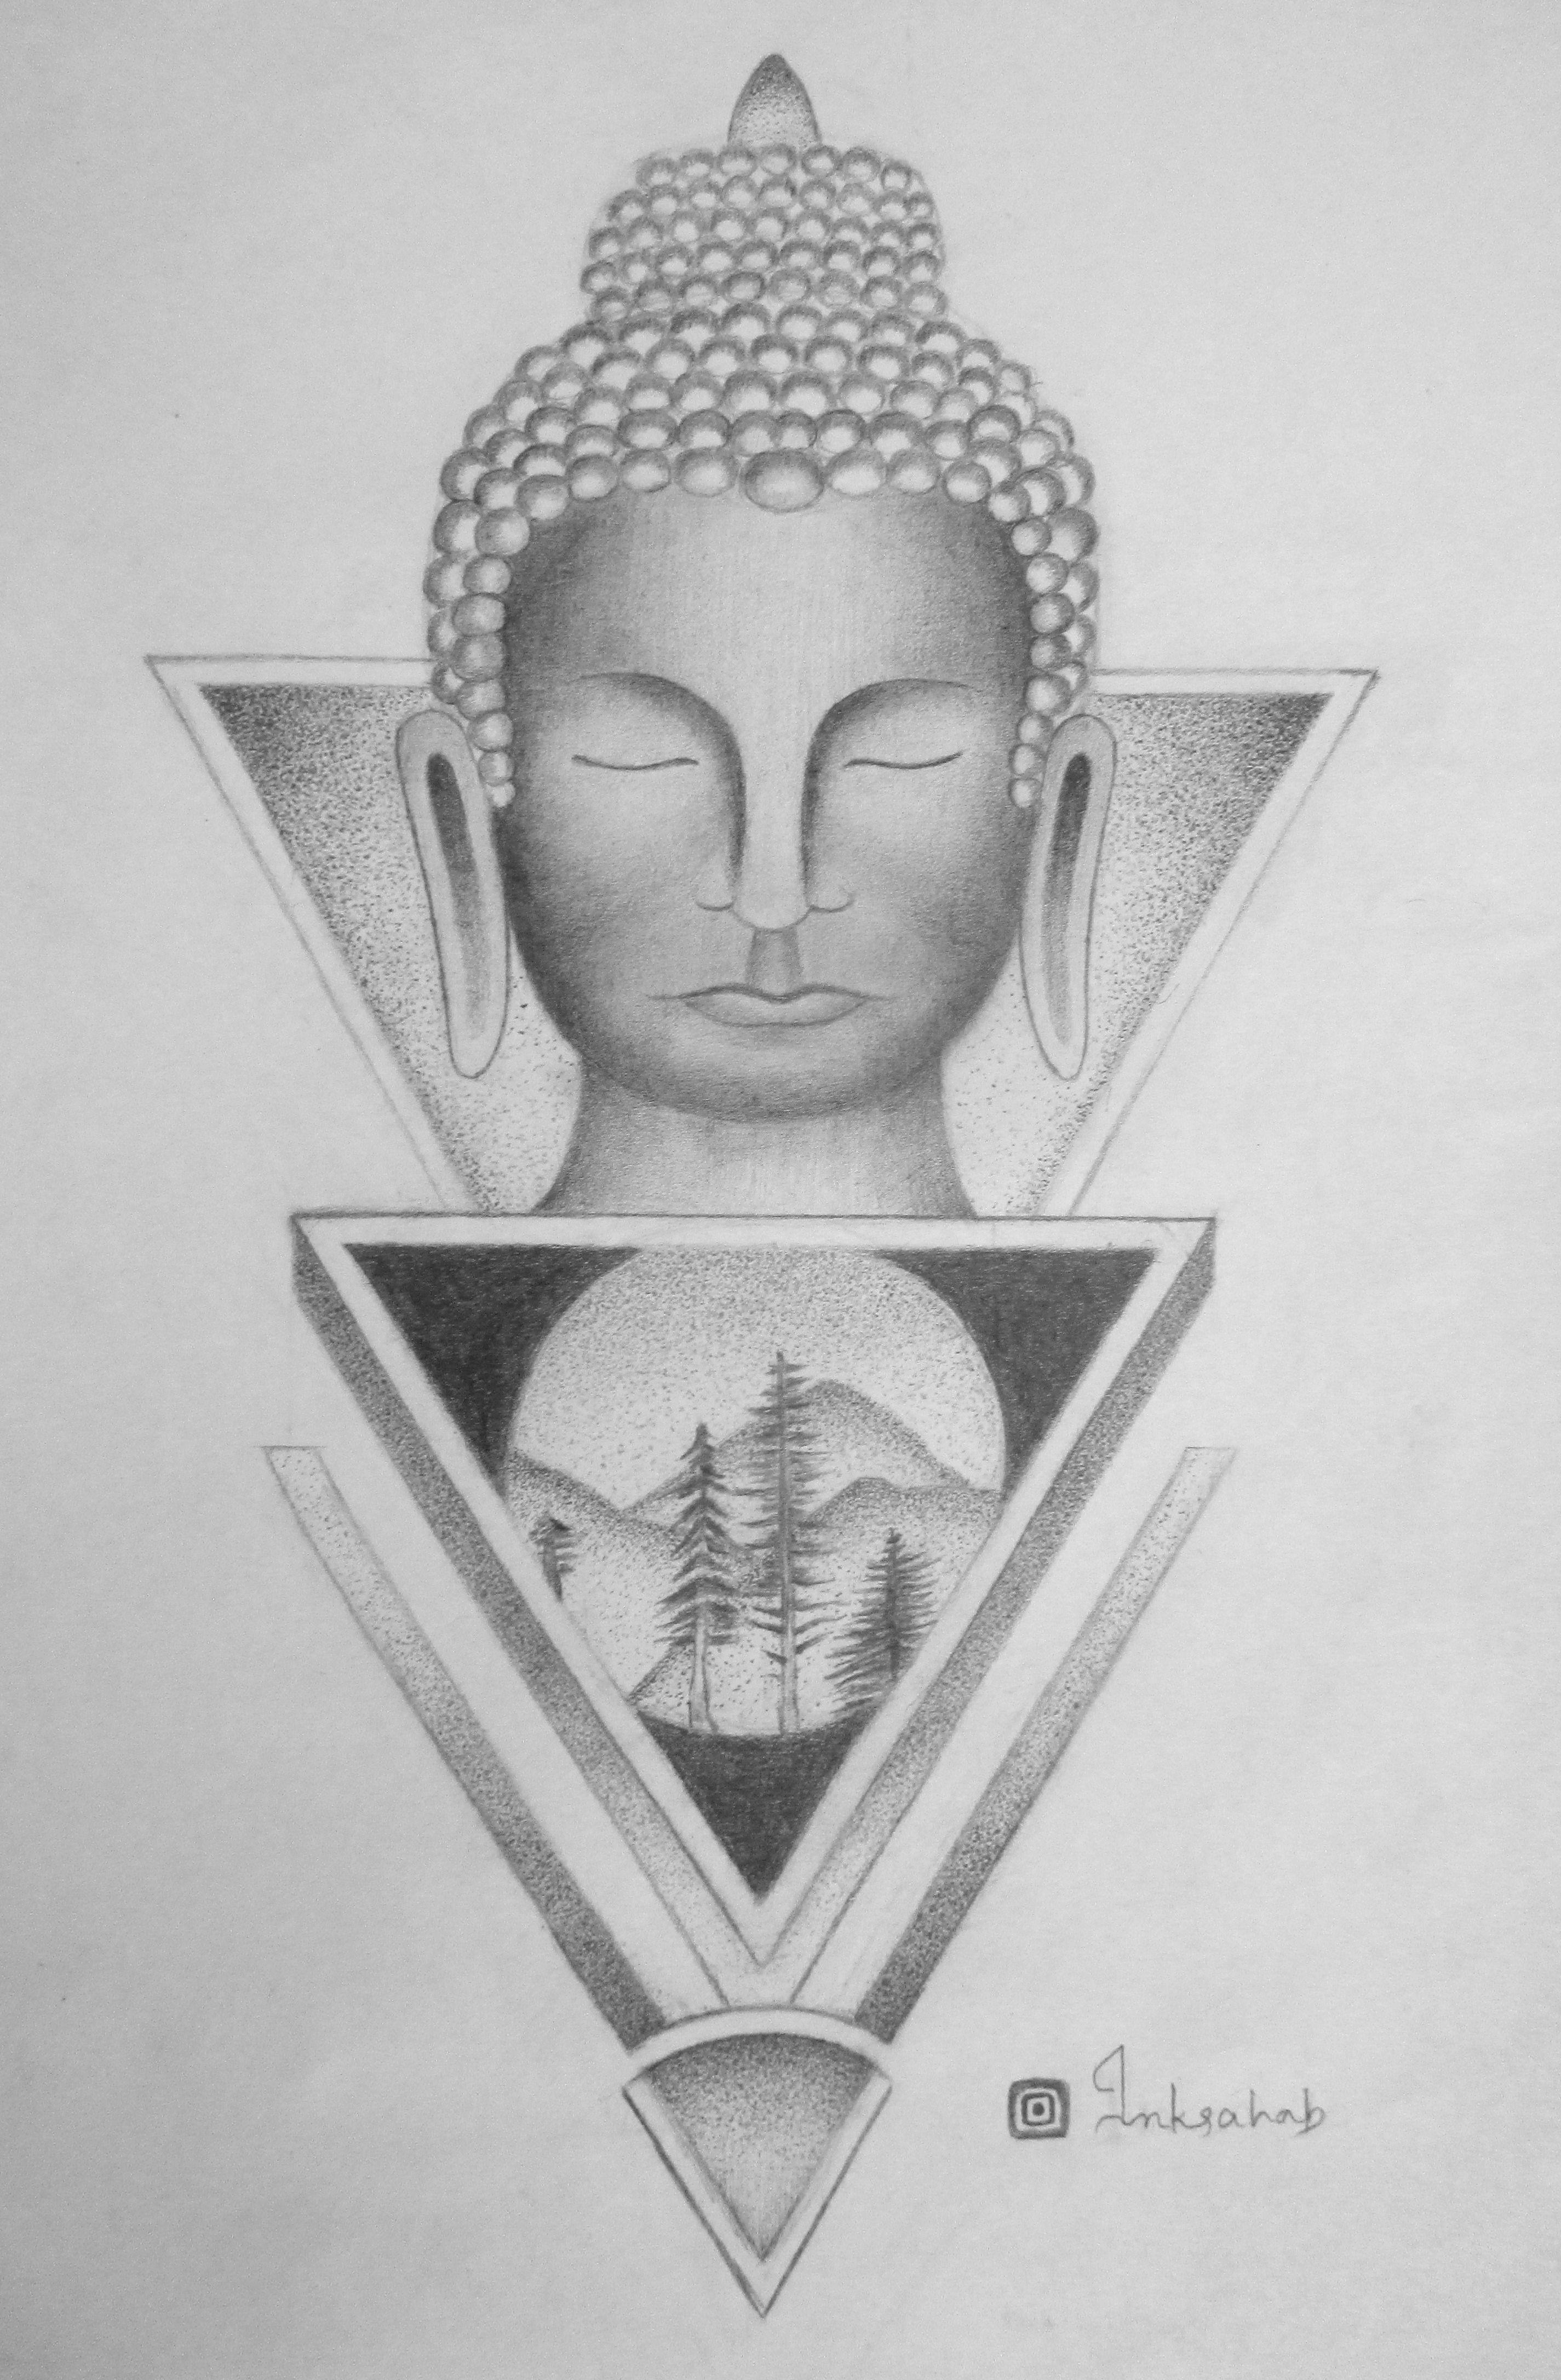 My Creation. Customize drawing by shrashabh chouhan. If